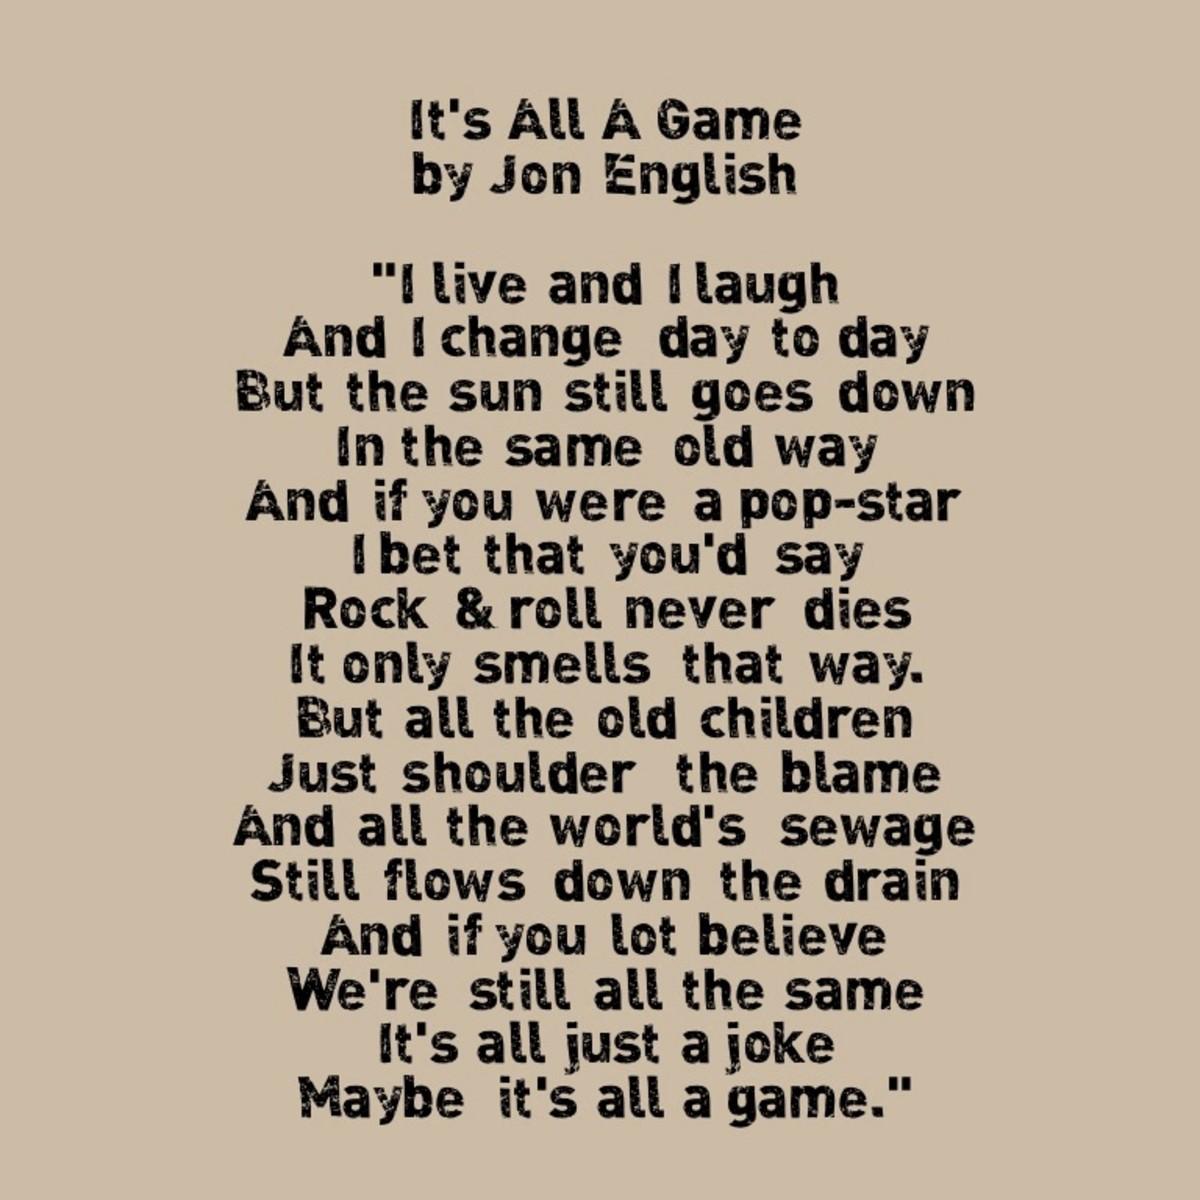 jon-english-its-all-a-game